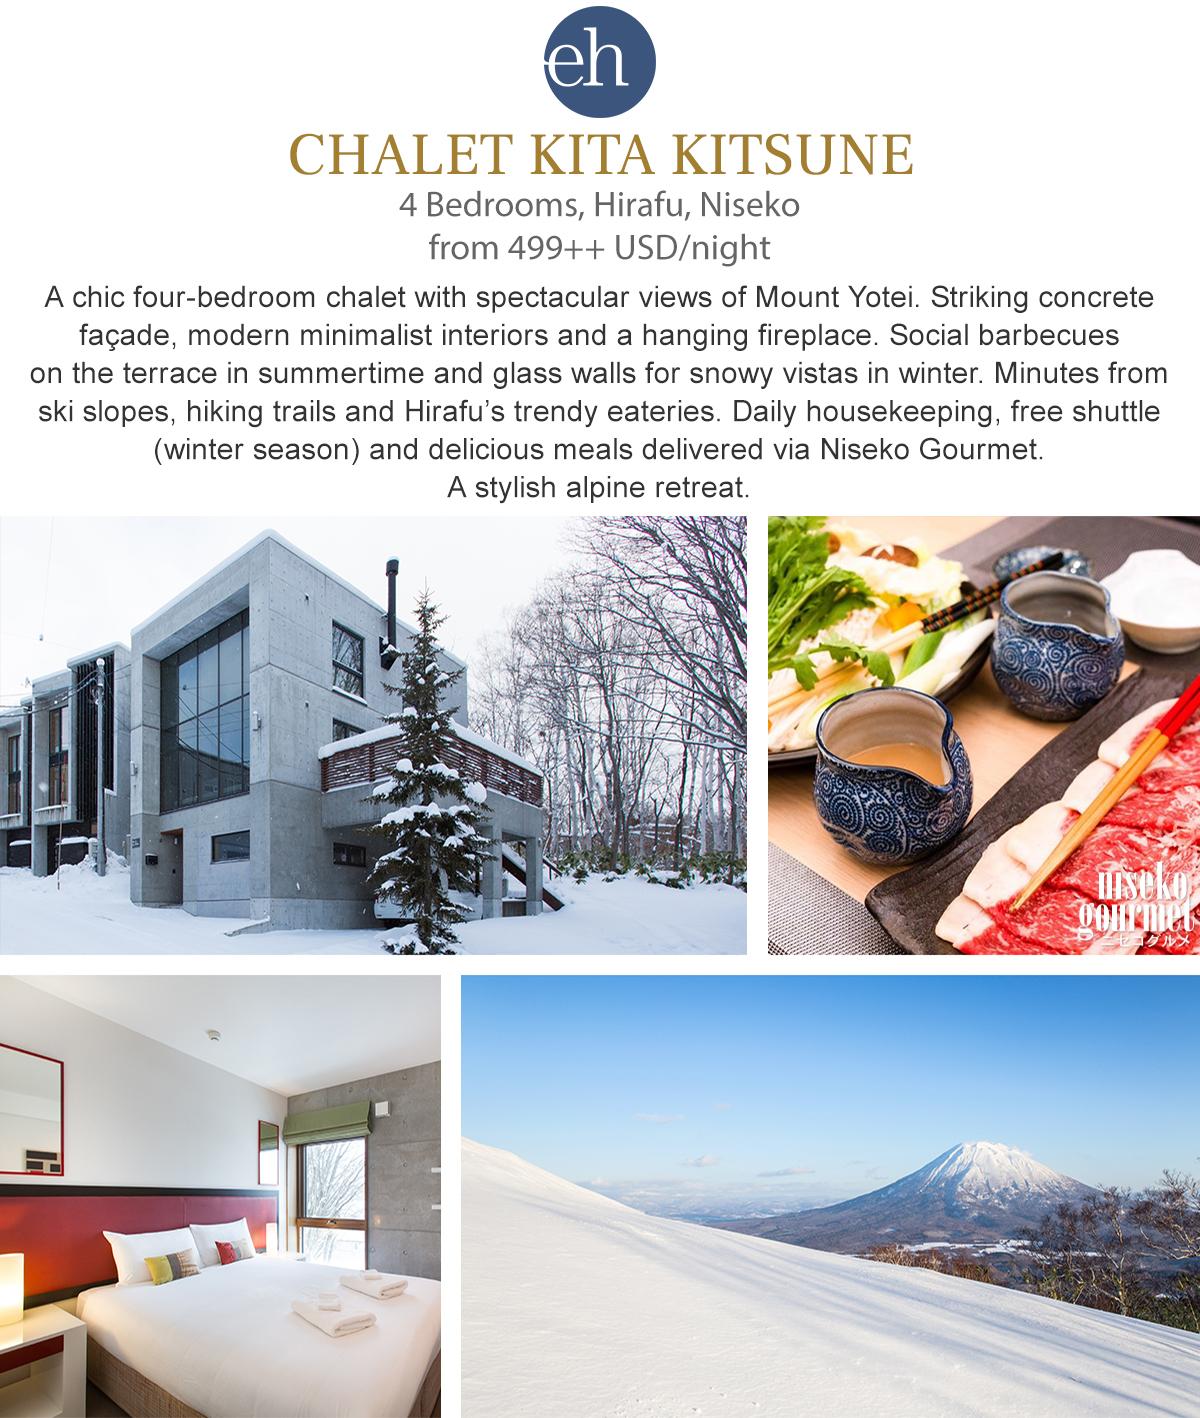 Chalet Kita Kitsune - Niseko, Japan